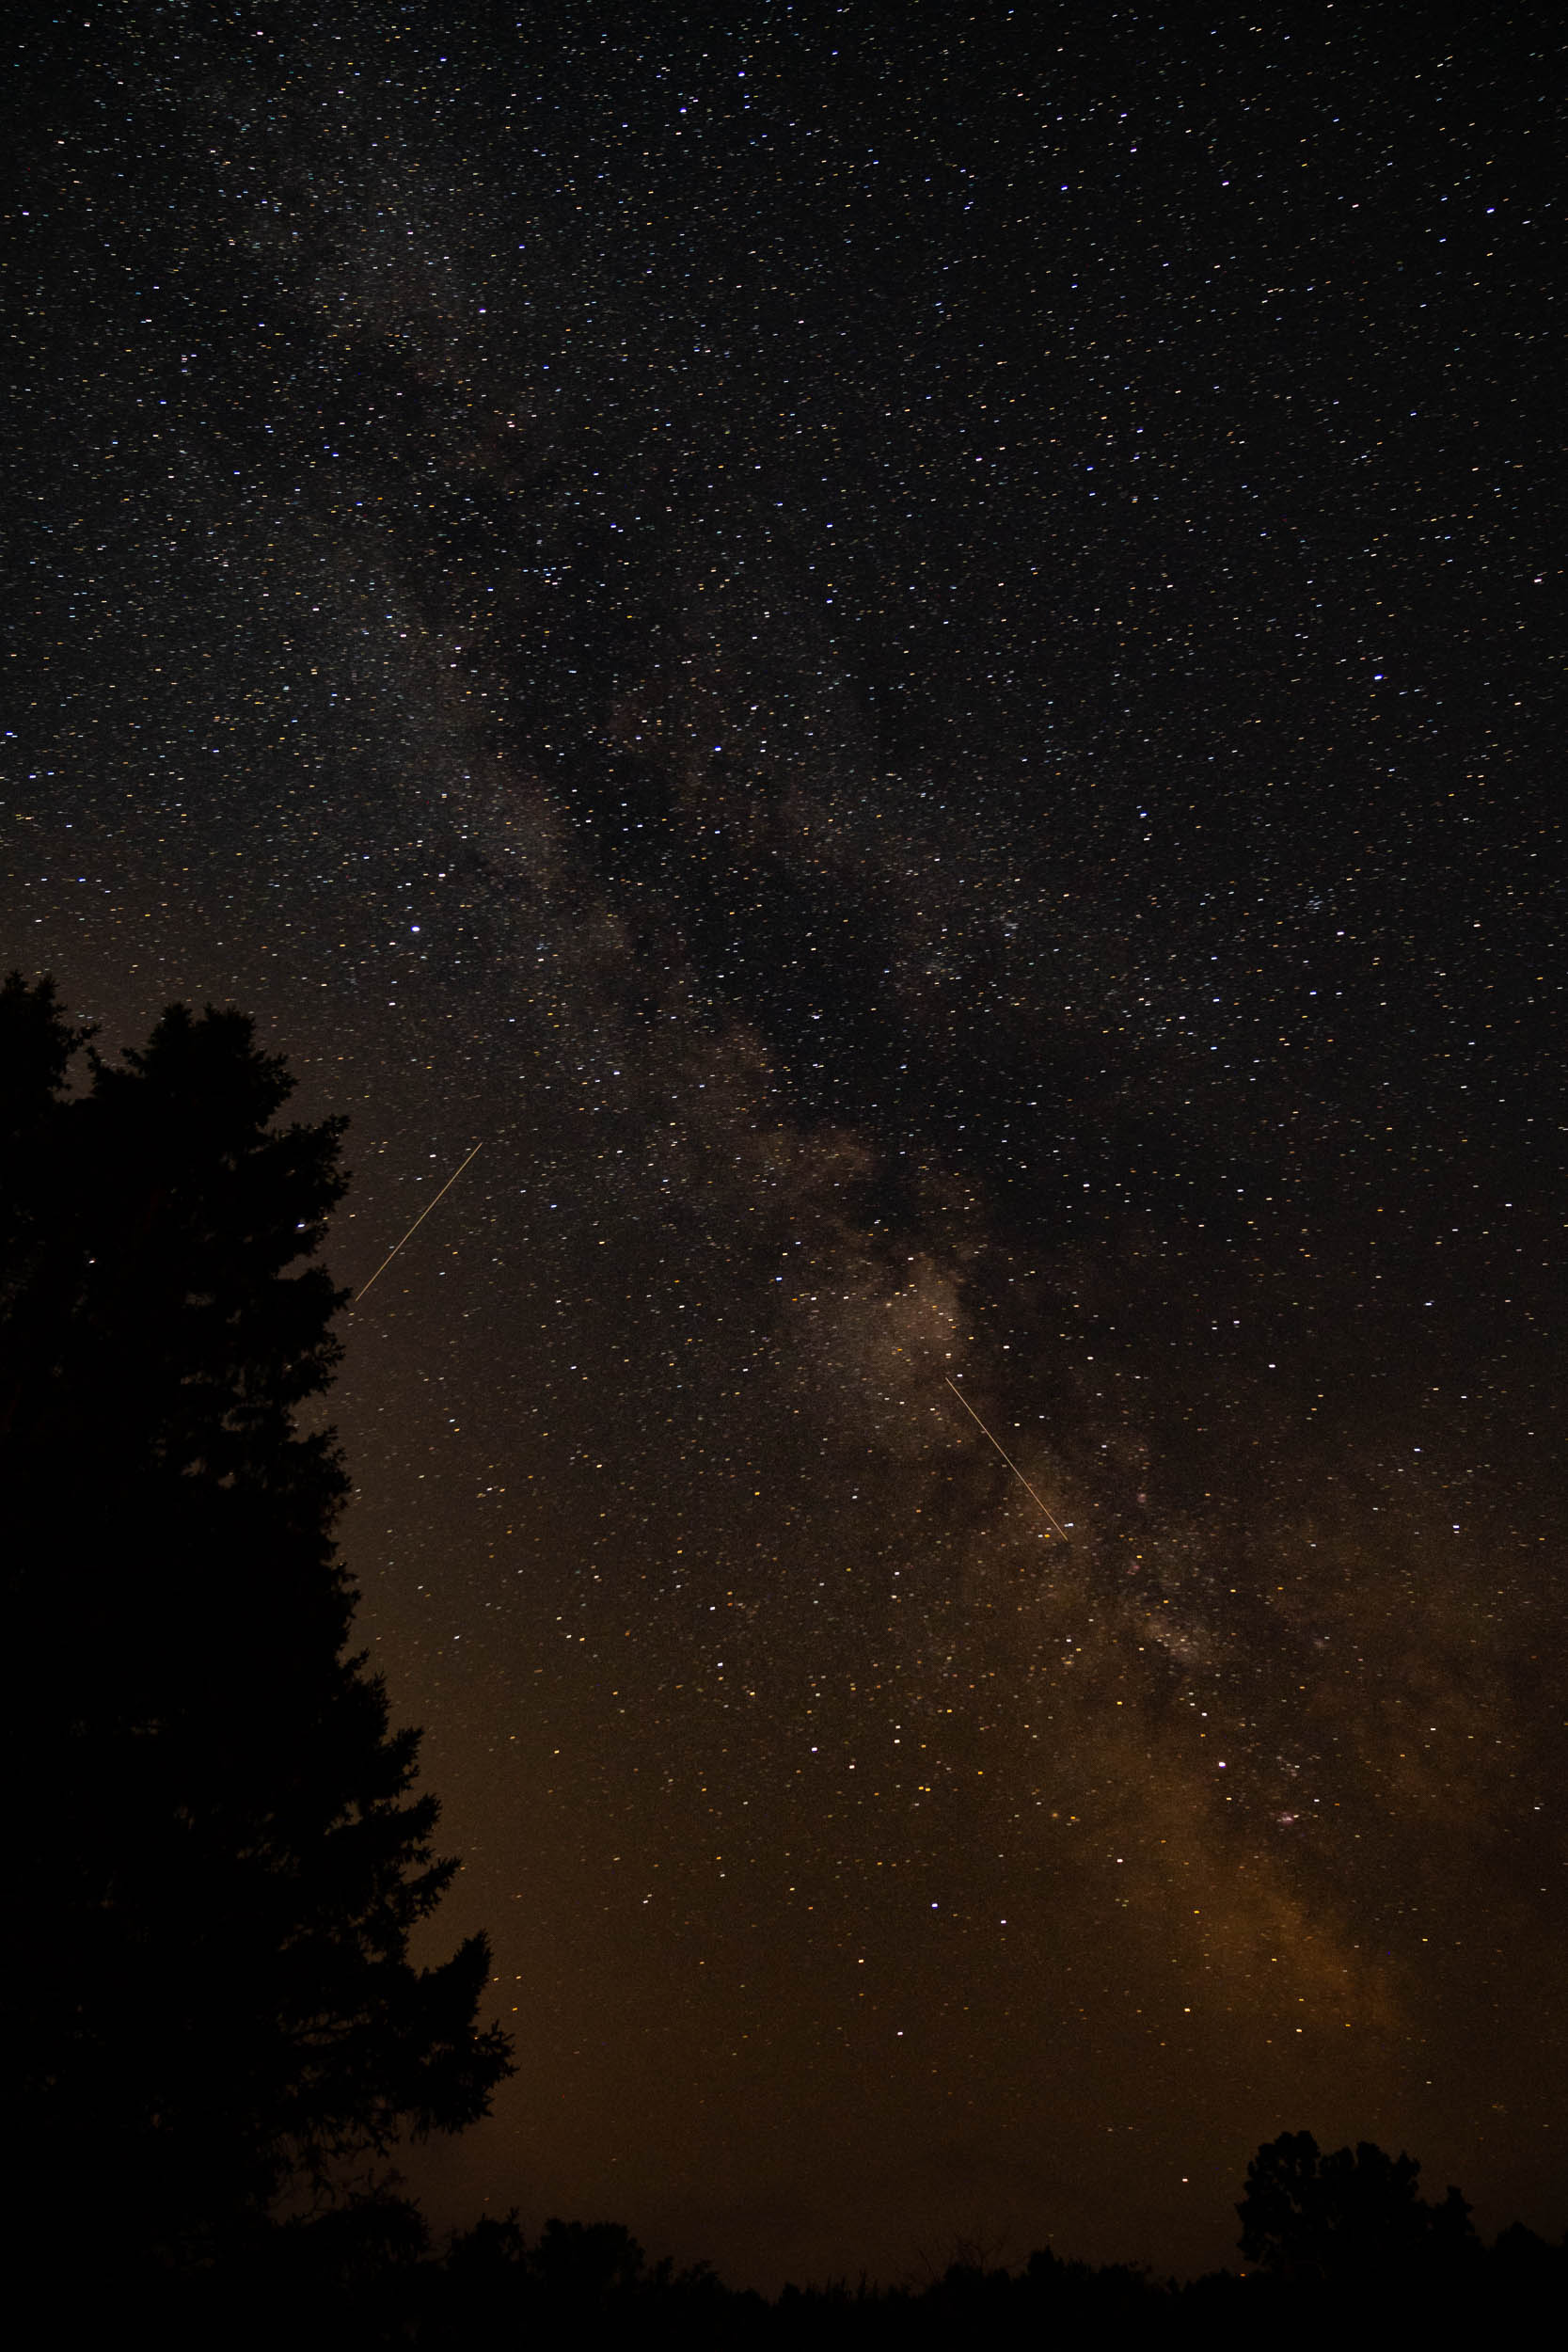 Milky Way astrology nightscape stars | Photo by BillyBengtson.com